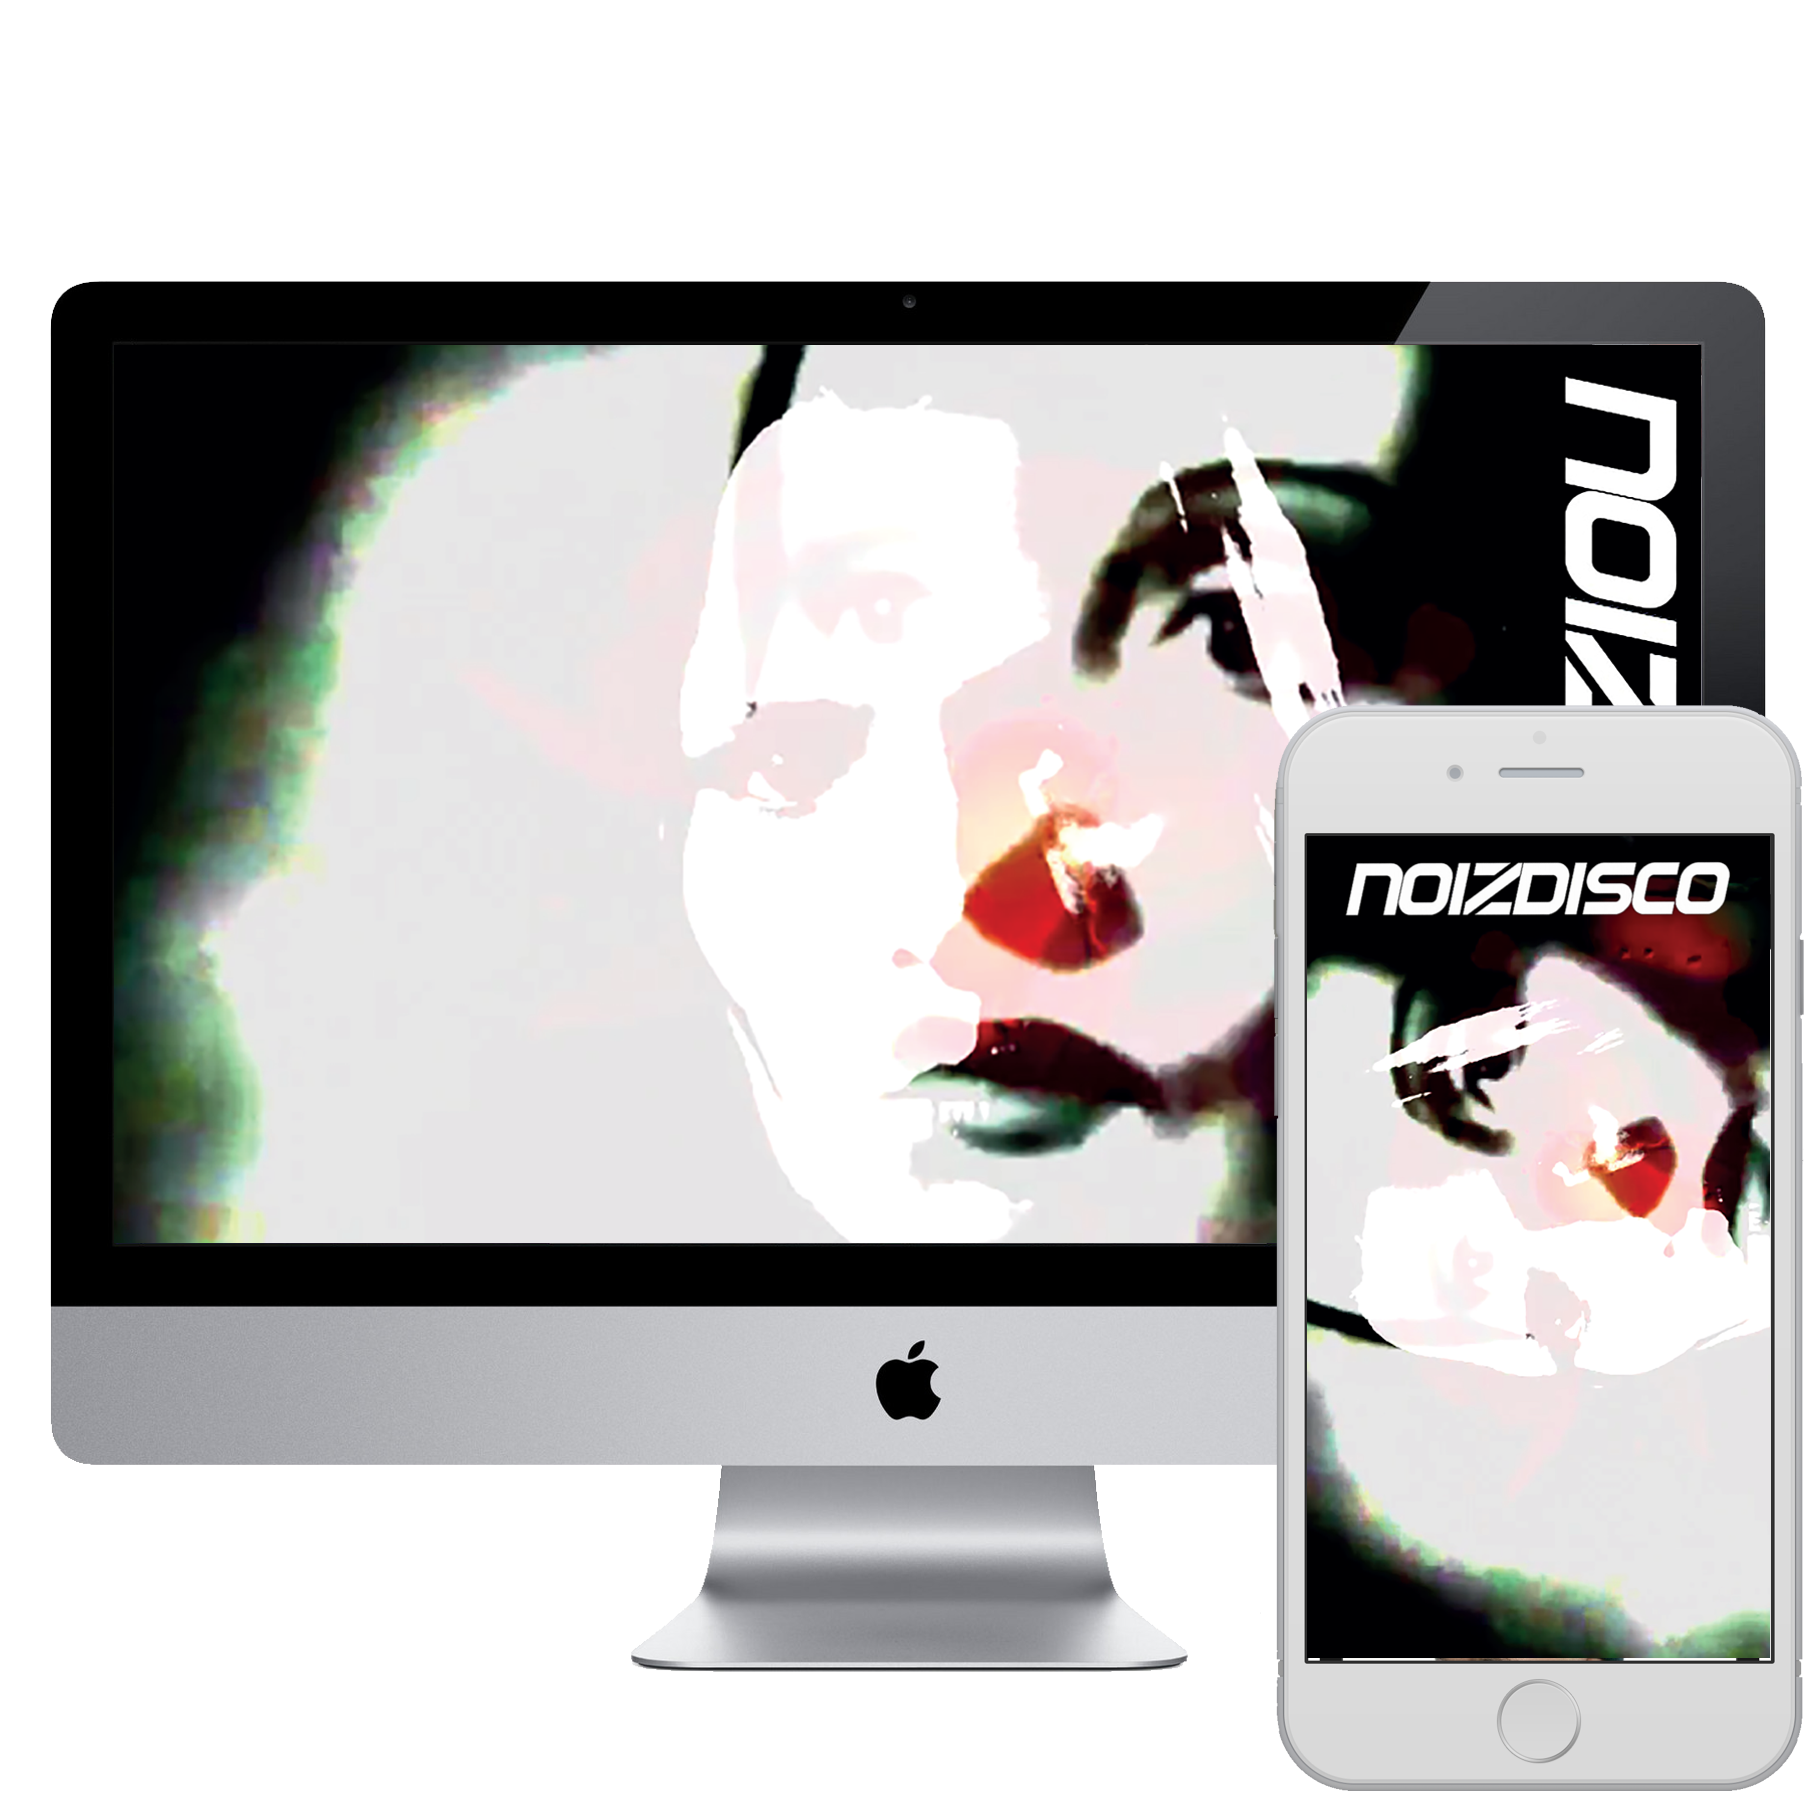 Mobile & Desktop Wallpapers - Noizdisco